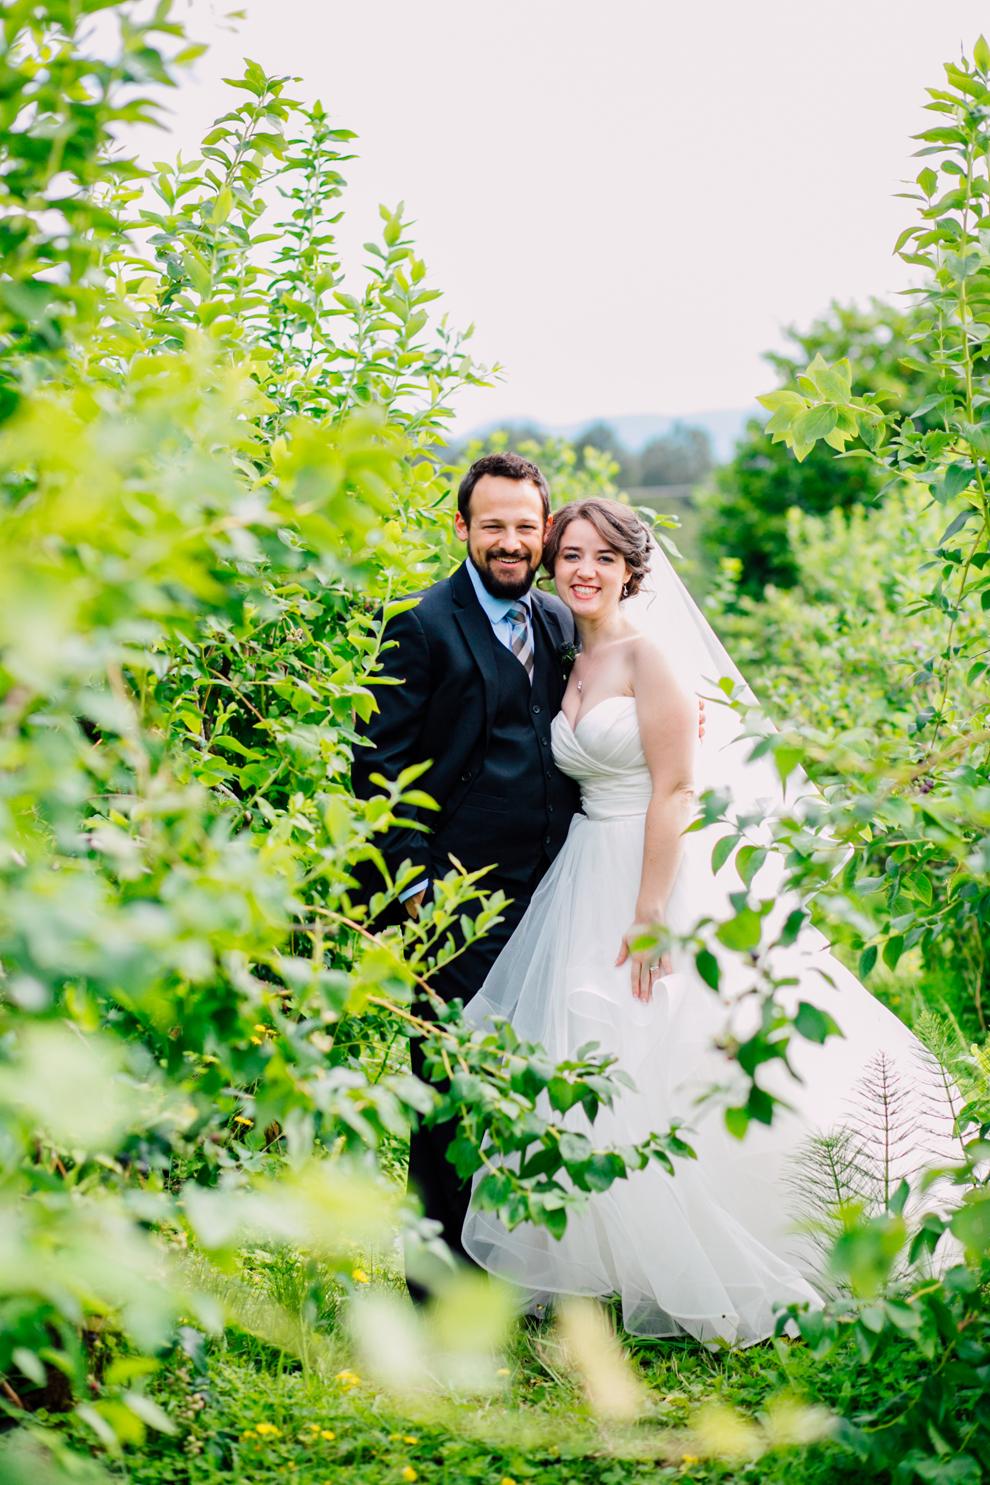 069-bybee-farms-north-bend-issaquah-washington-wedding-katheryn-moran-photography-allisonjon.jpg